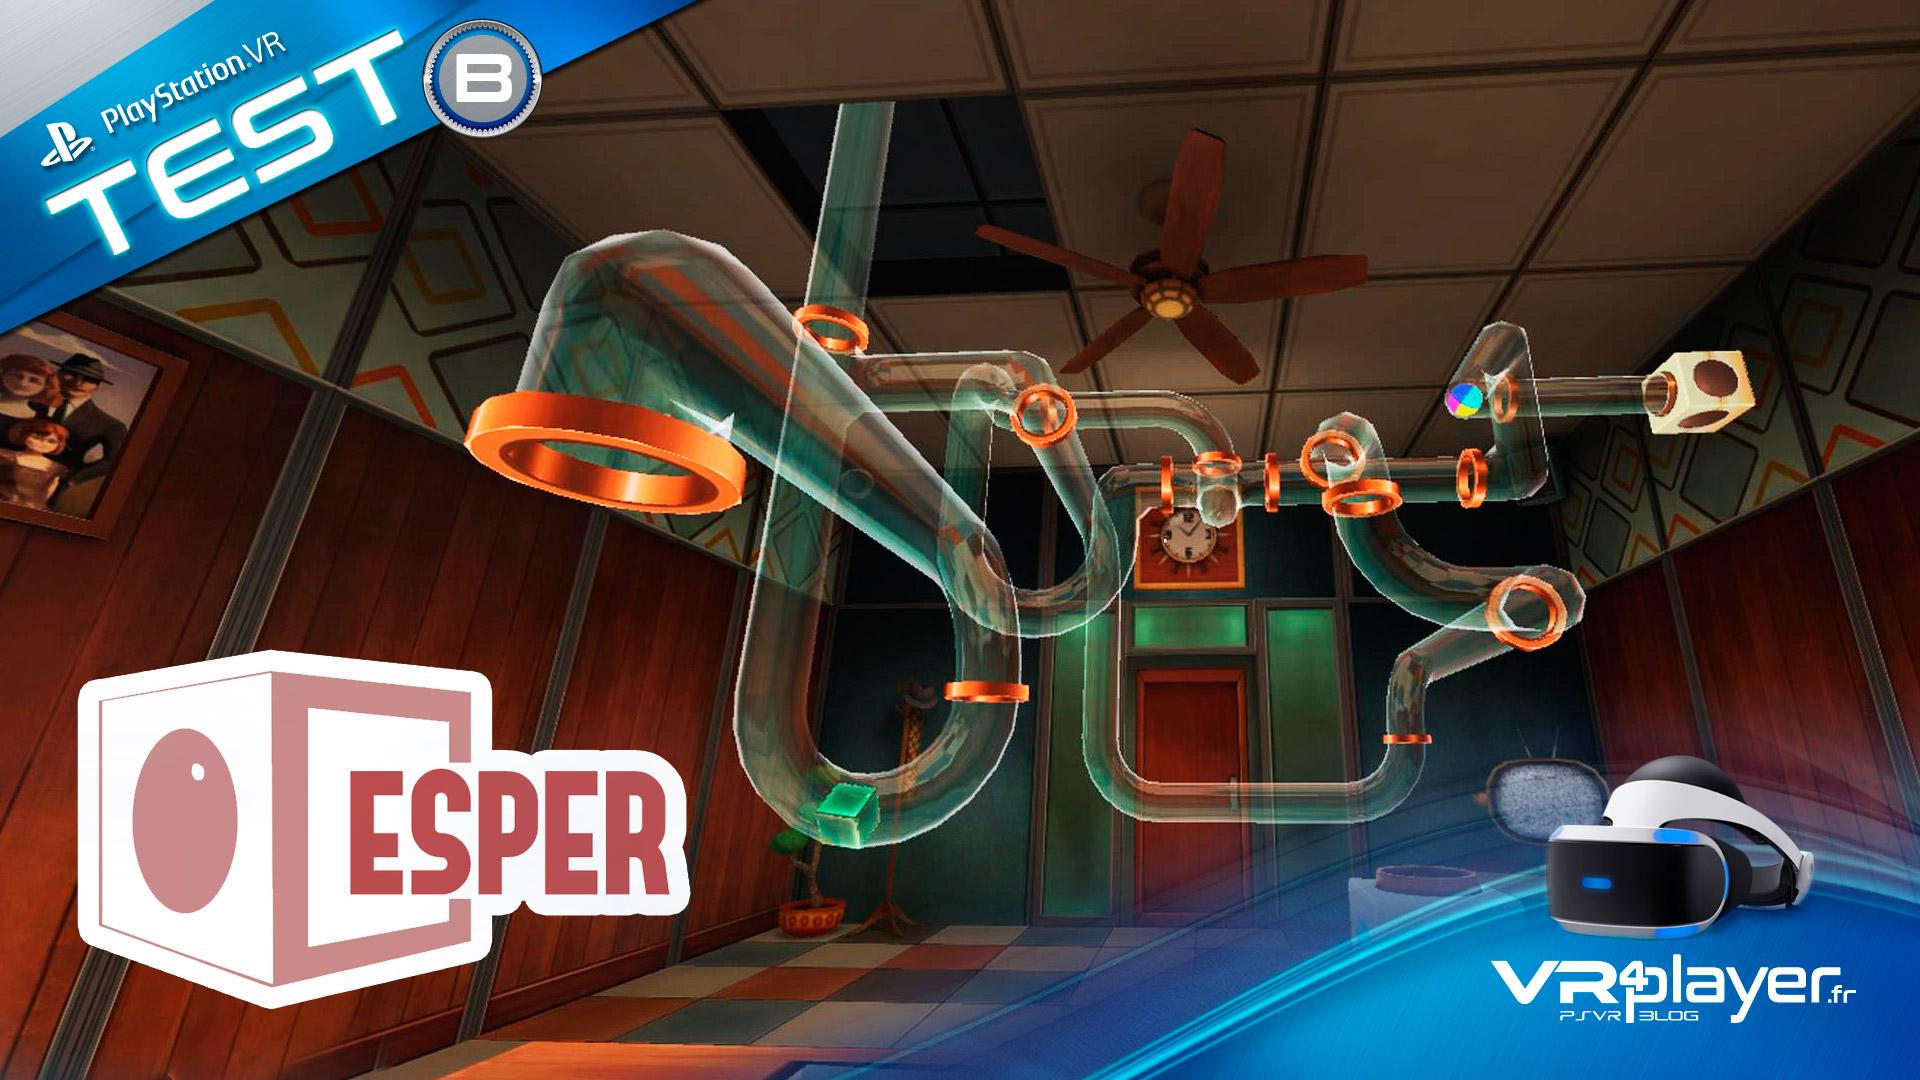 Esper VR test Review VR4Player